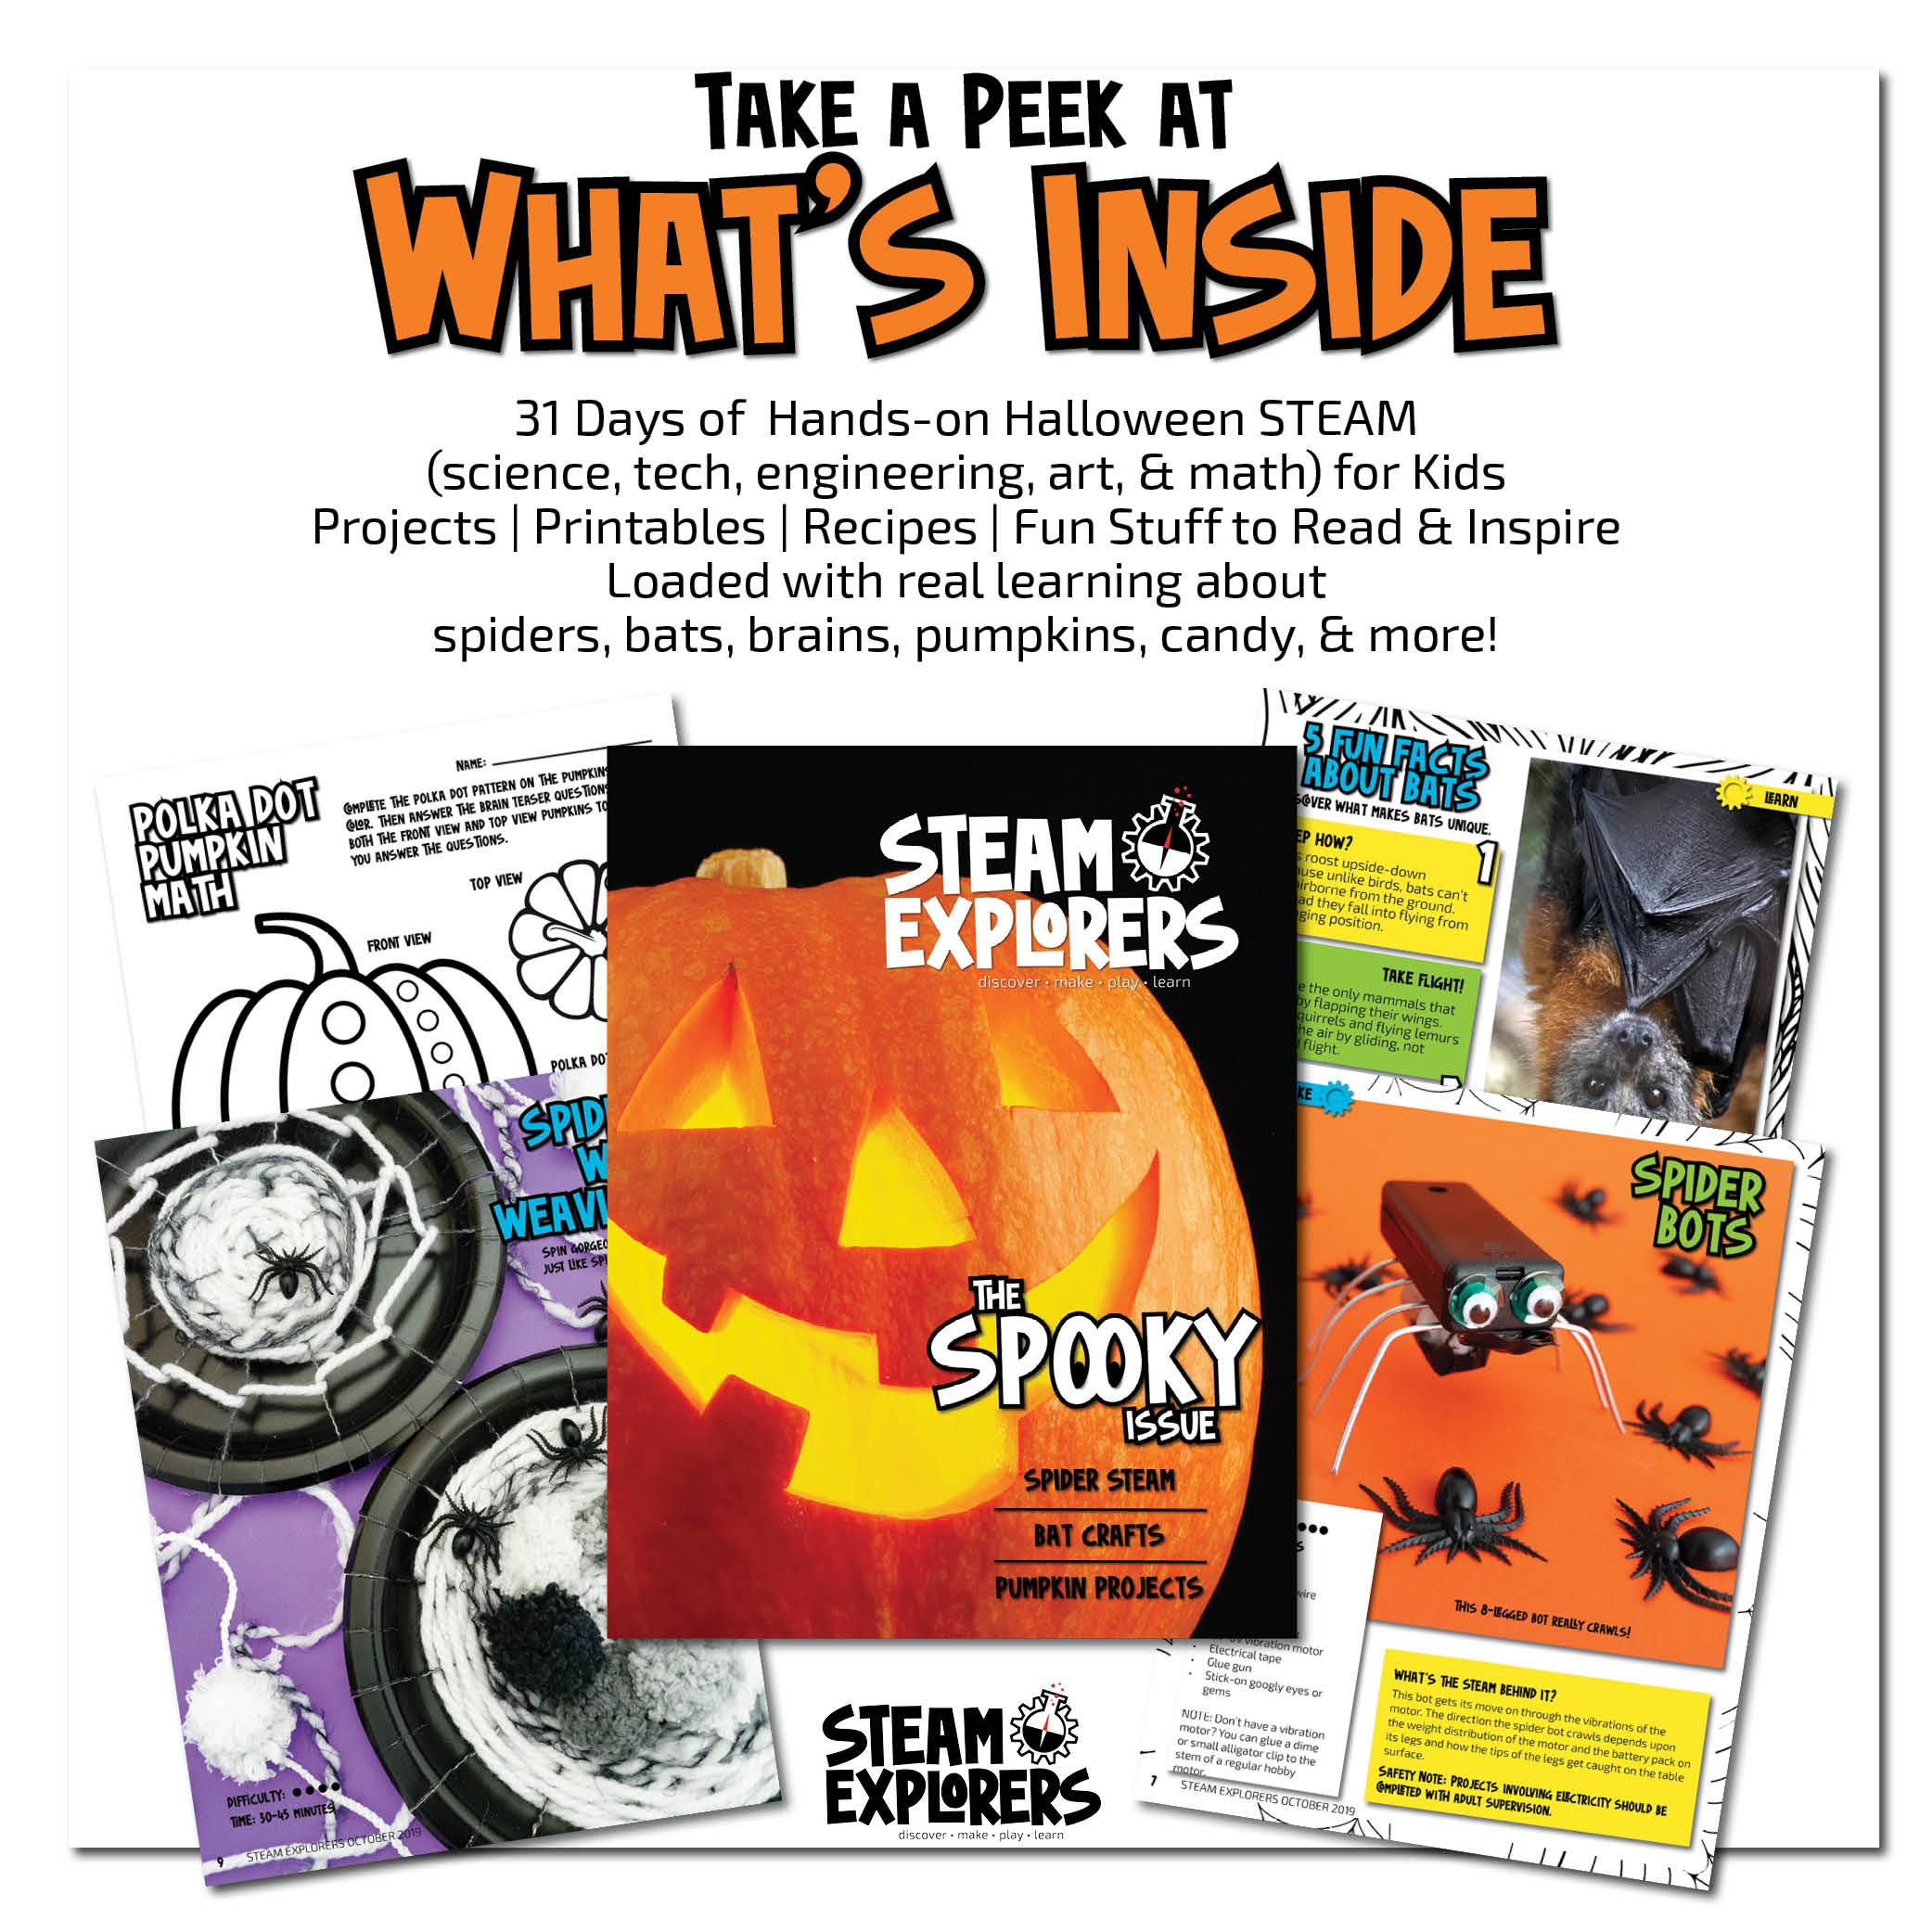 Halloween Engineering Projects For Kids Left Brain Craft Brain